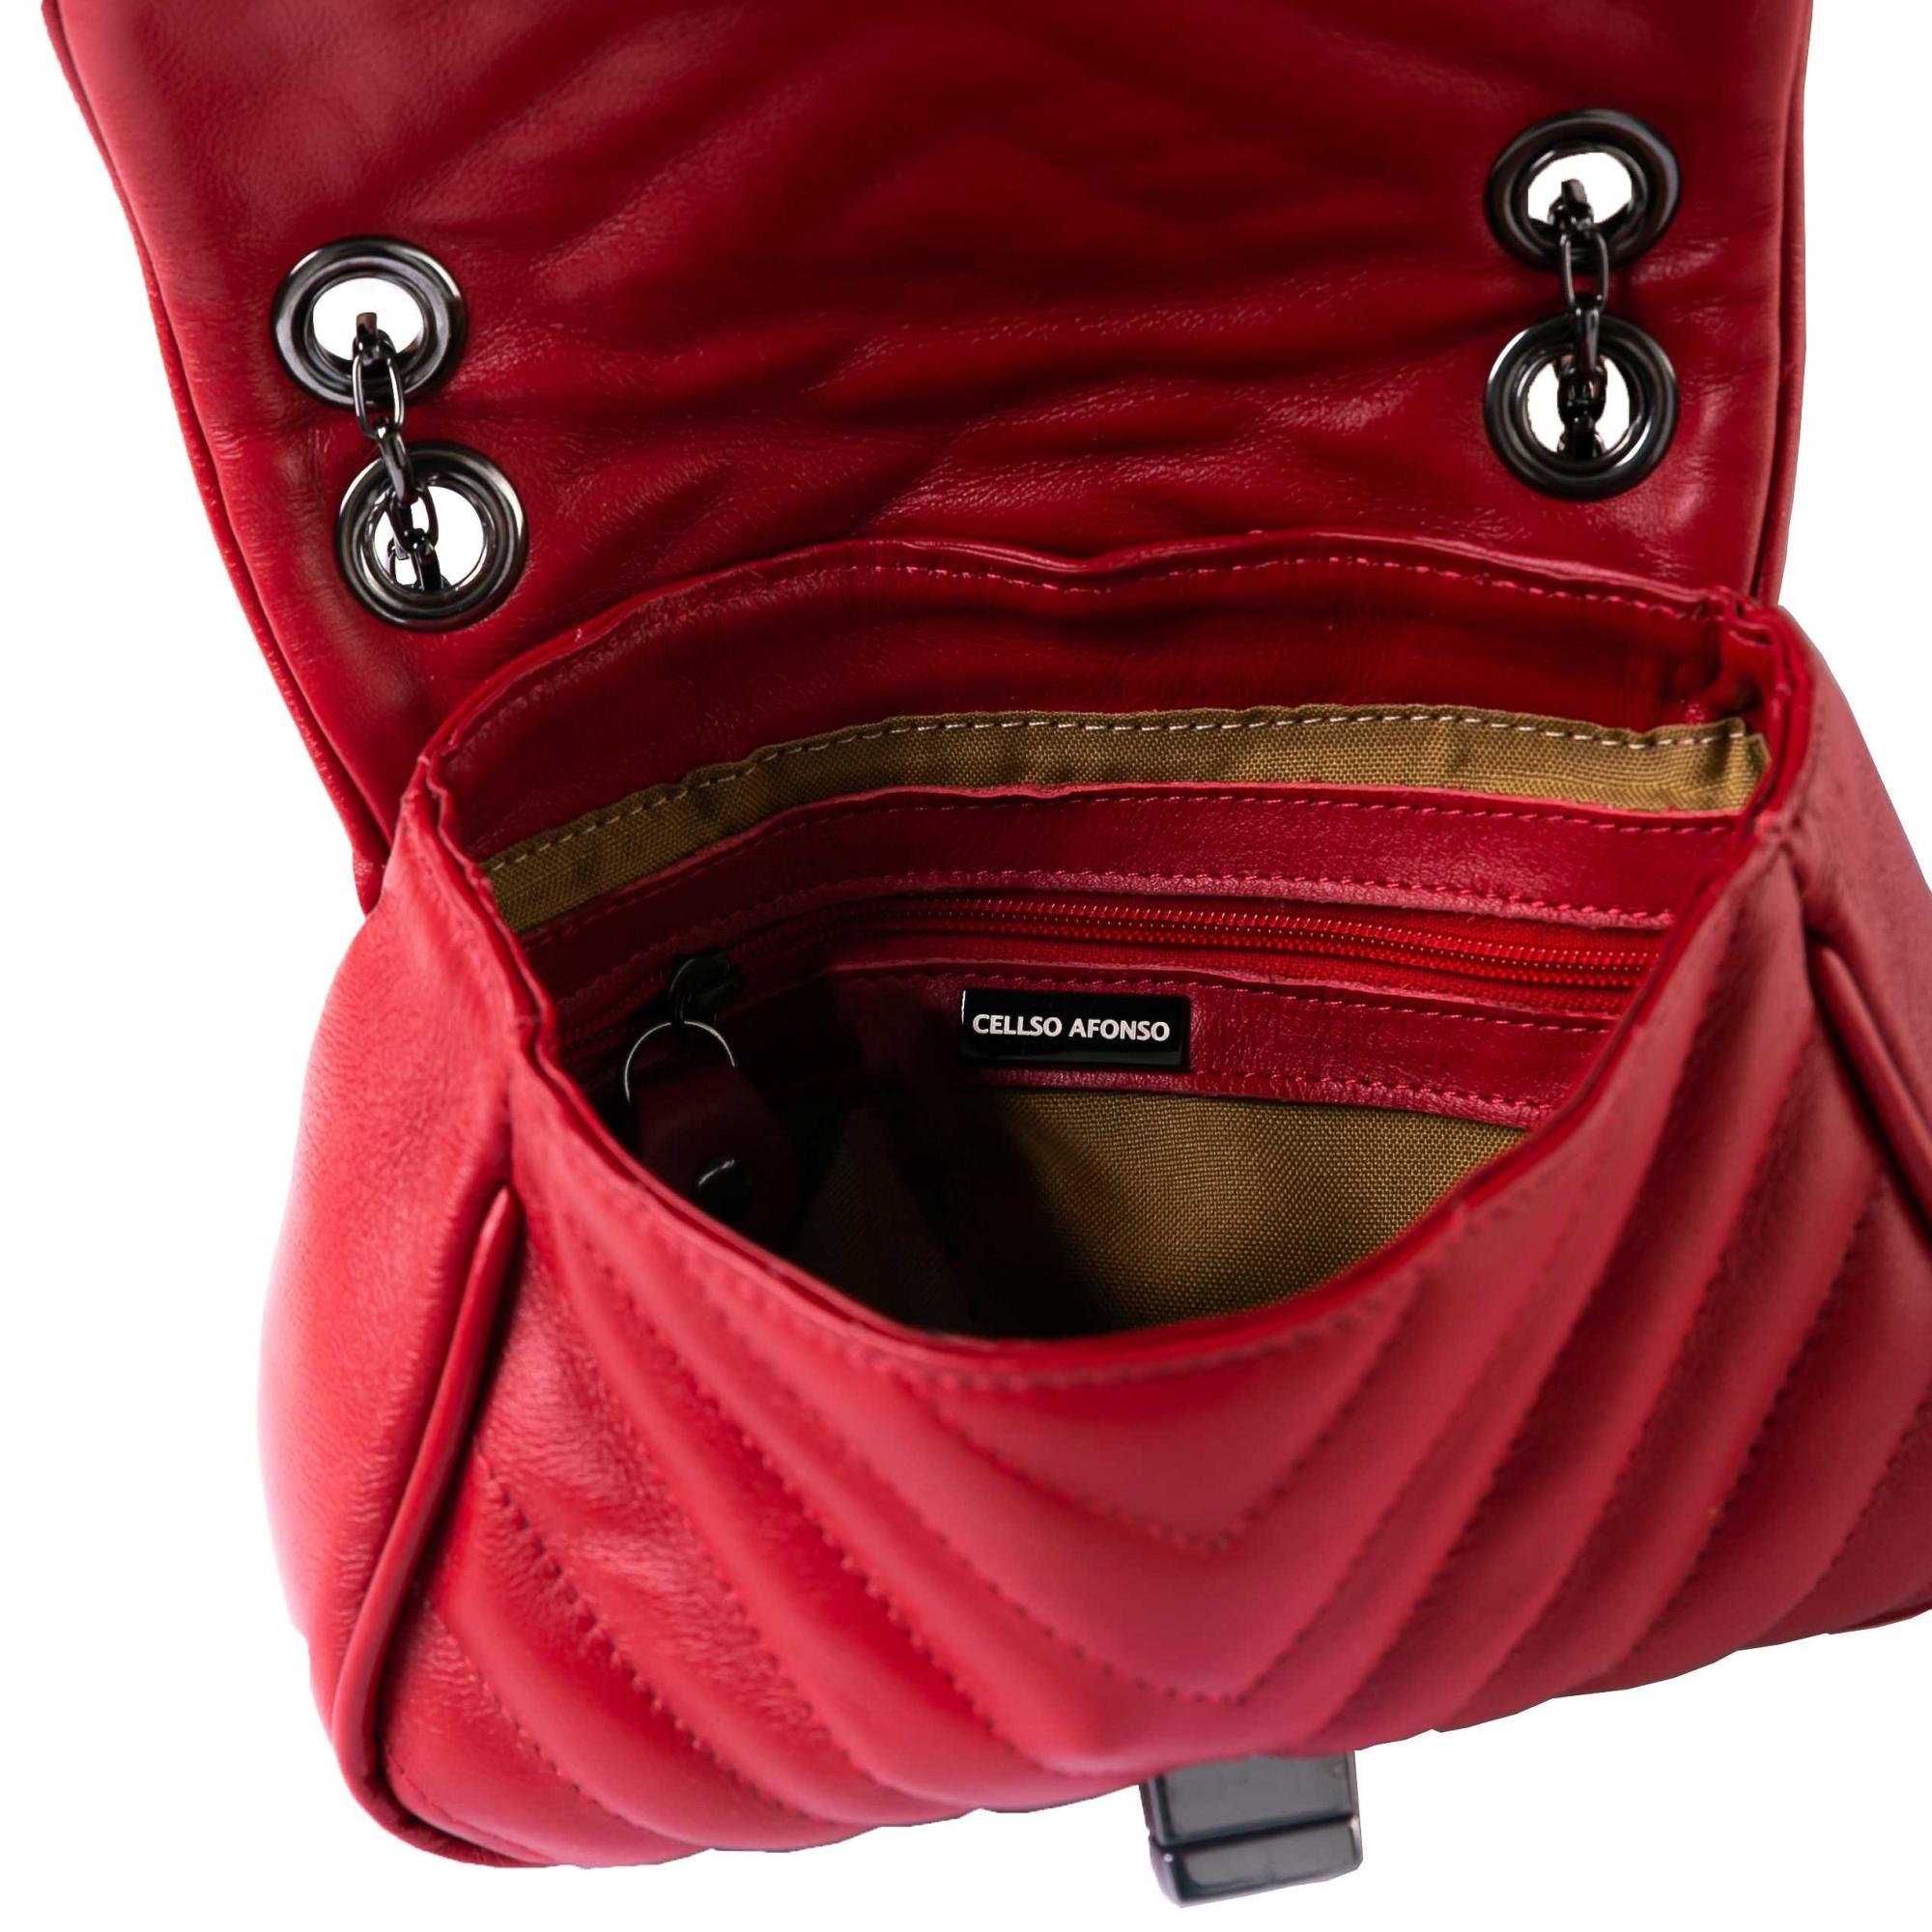 Mini bolsa matelasse chevron couro vermelho.  - Cellso Afonso